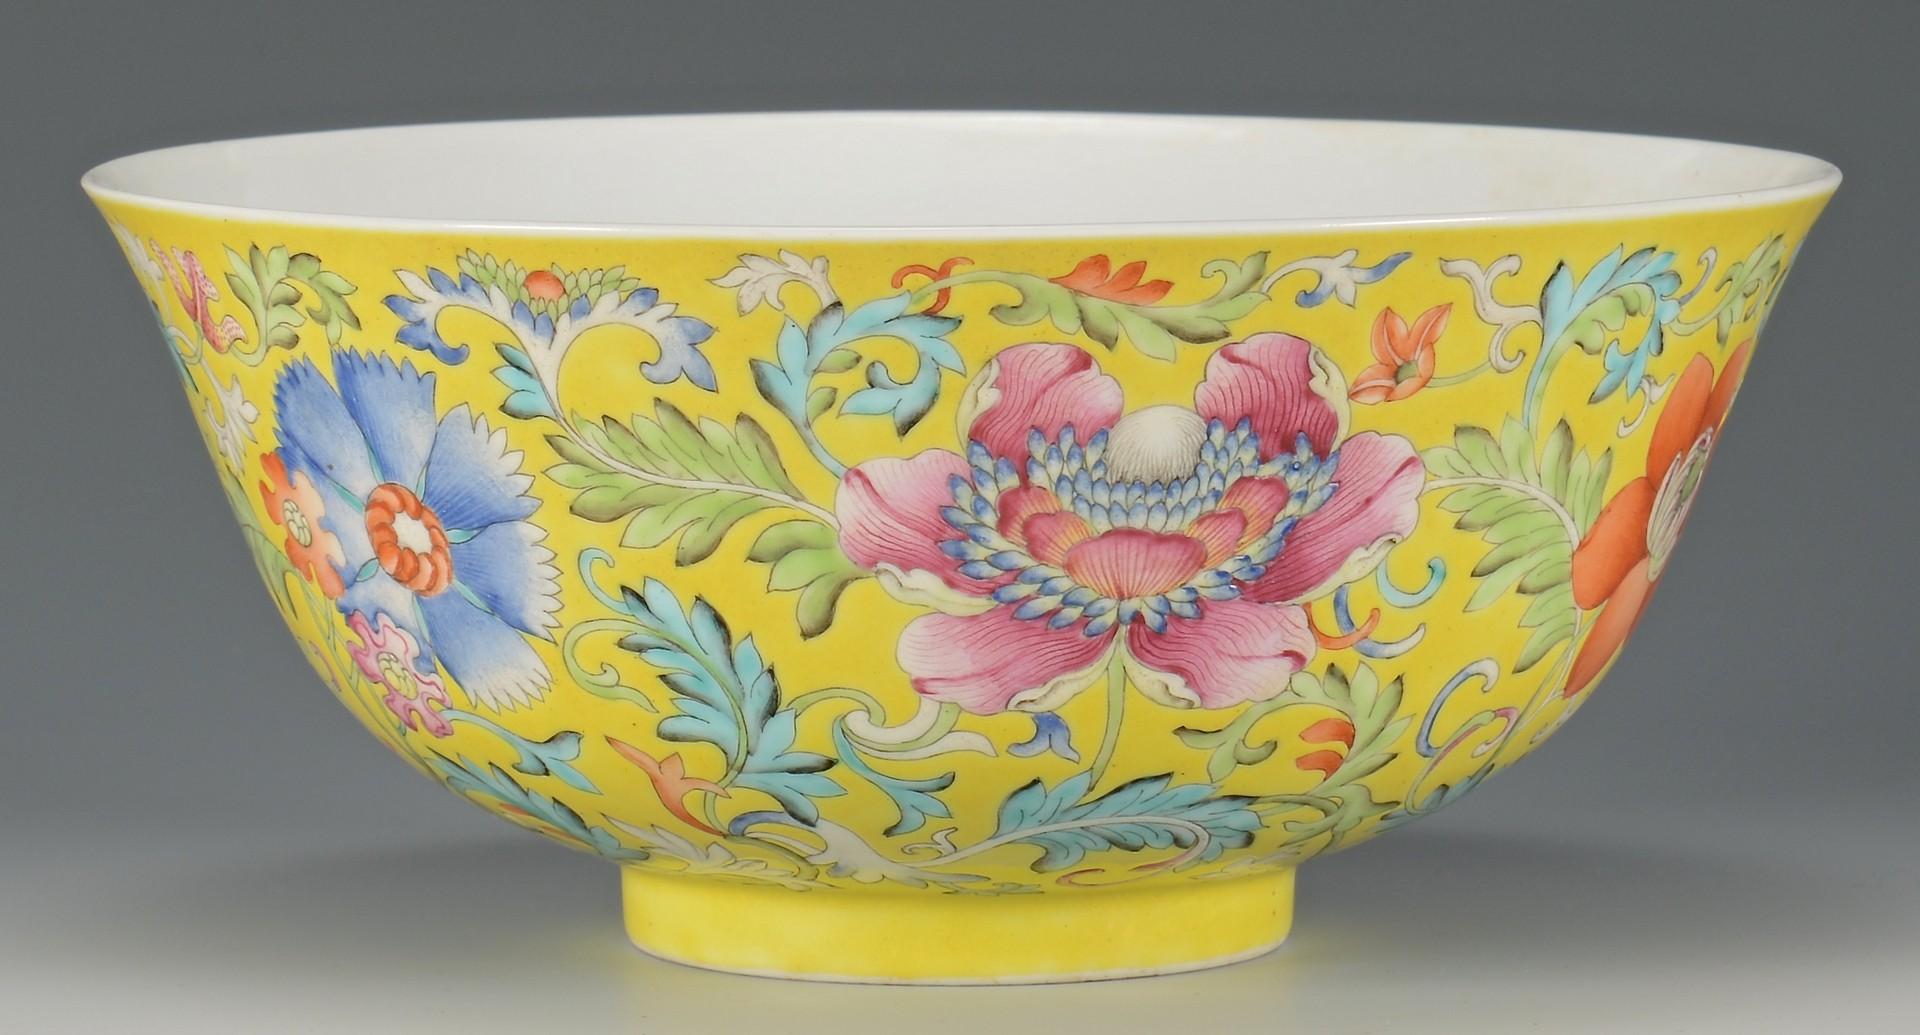 Lot 19: Pr. Guangxu Chinese Famille Rose Bowls, yellow gro